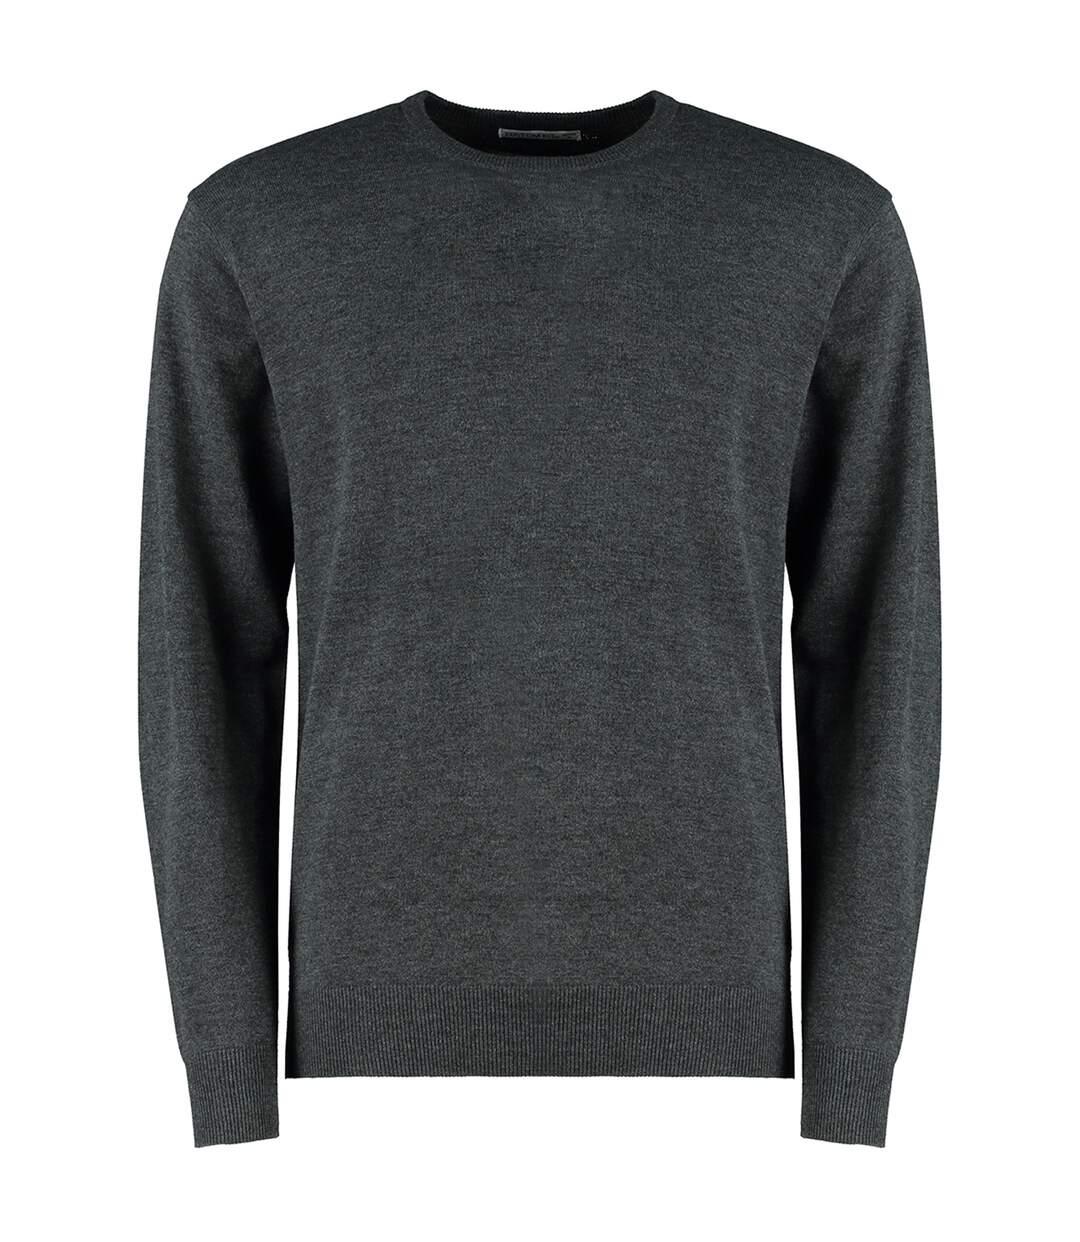 Kustom Kit Mens Arundel Crew Neck Sweater (Graphite Grey) - UTPC3840